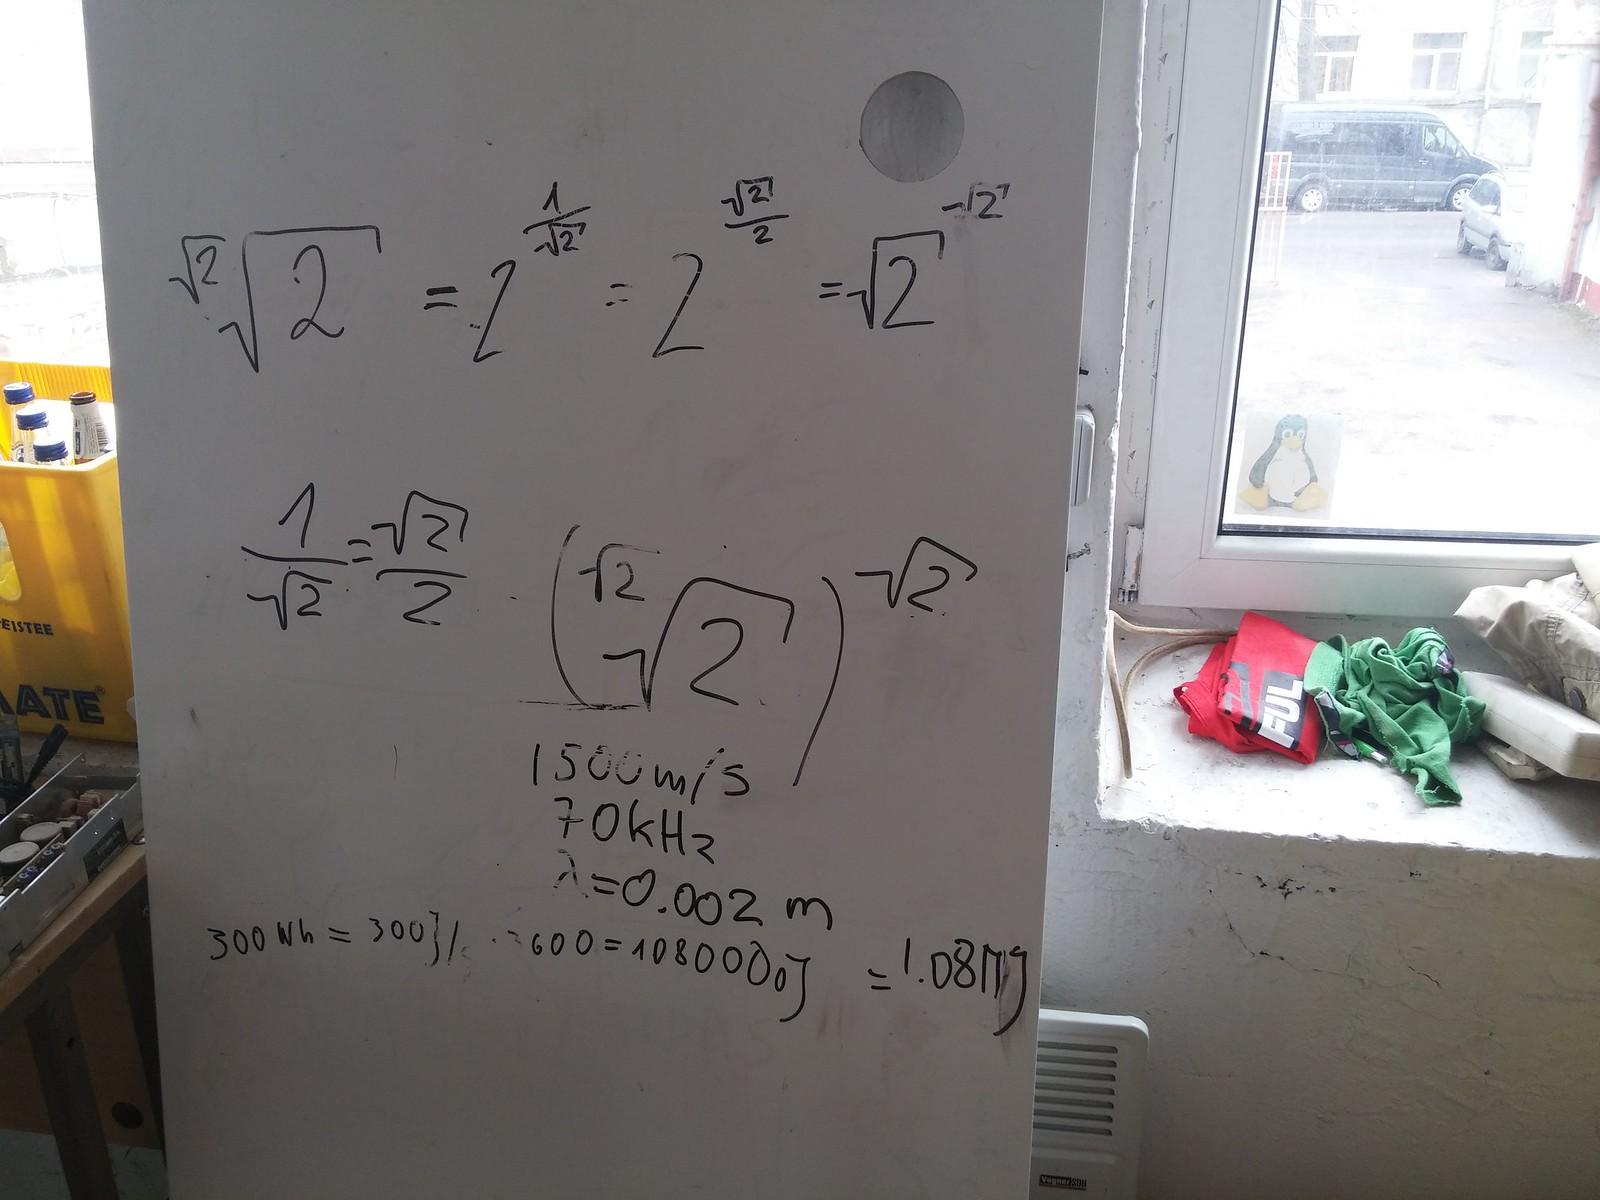 Matematika - visko pagrindas.